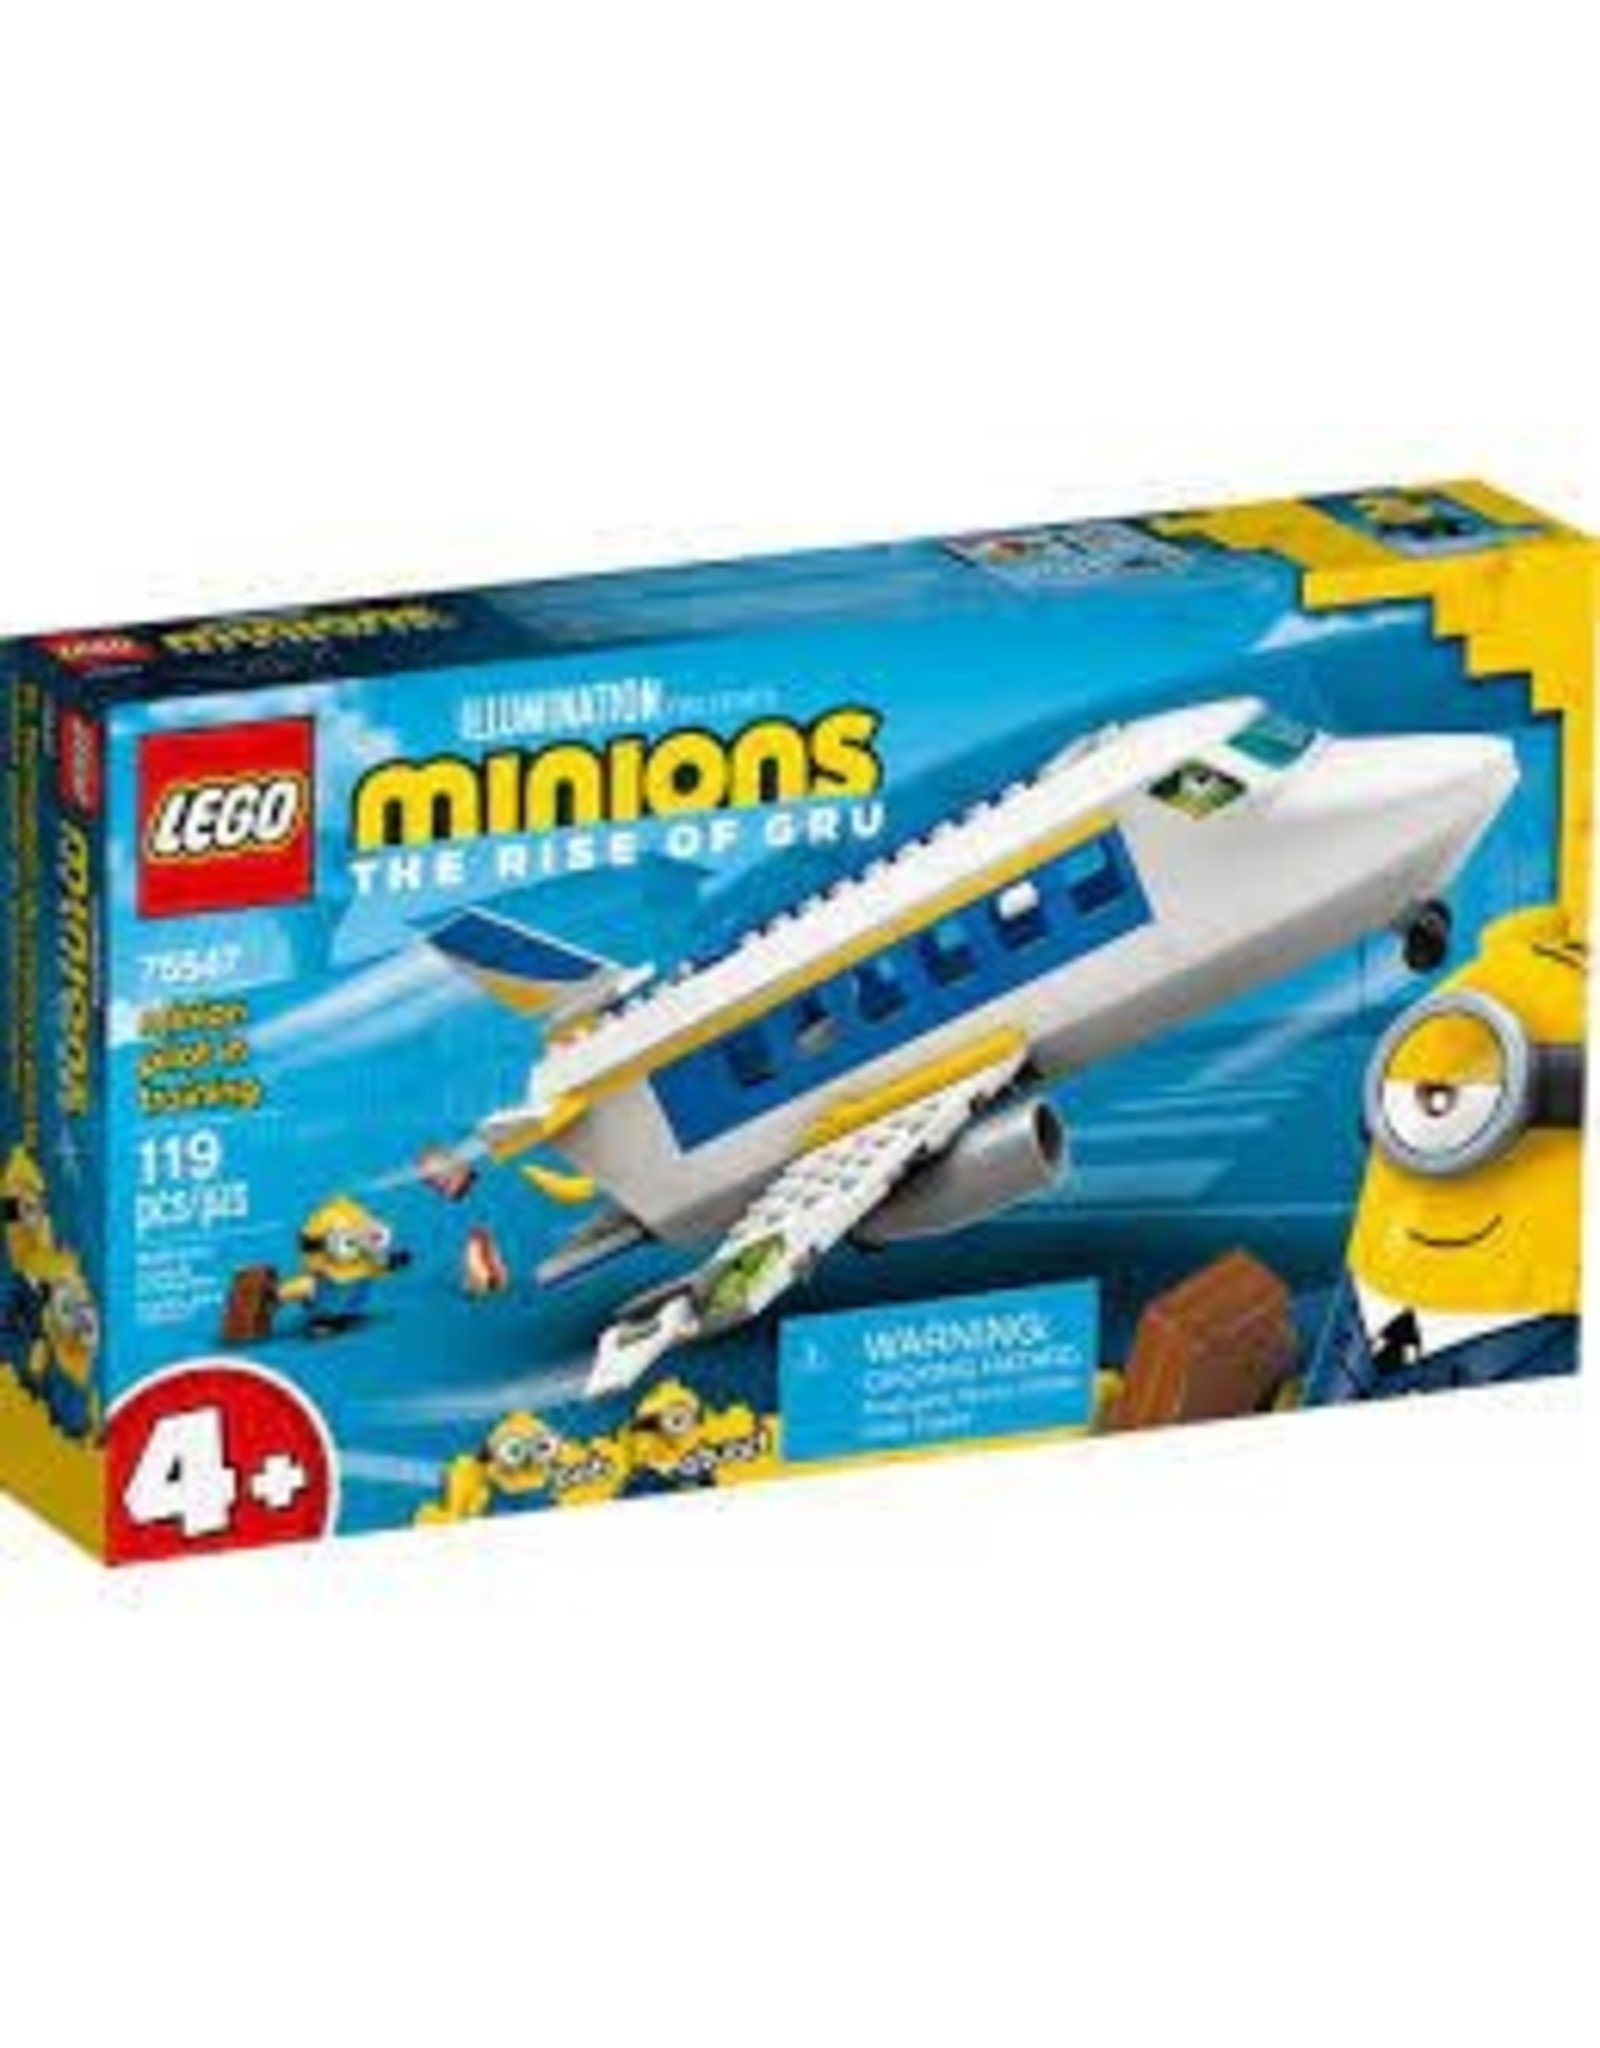 LEGO Minions - 75547 - Minion pilot in Training